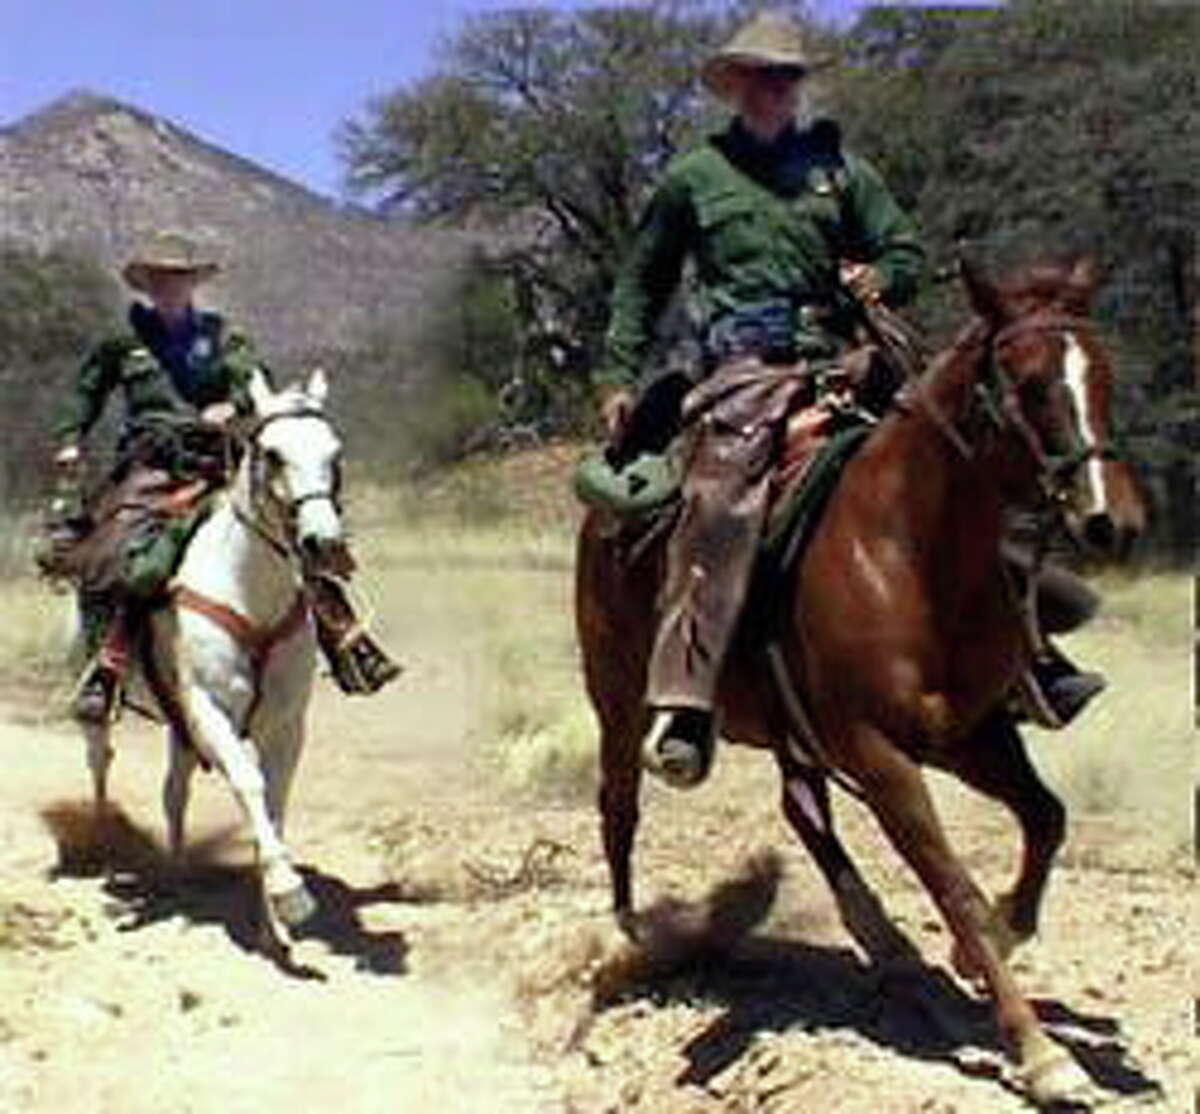 U.S. Border agents patrol on horseback.